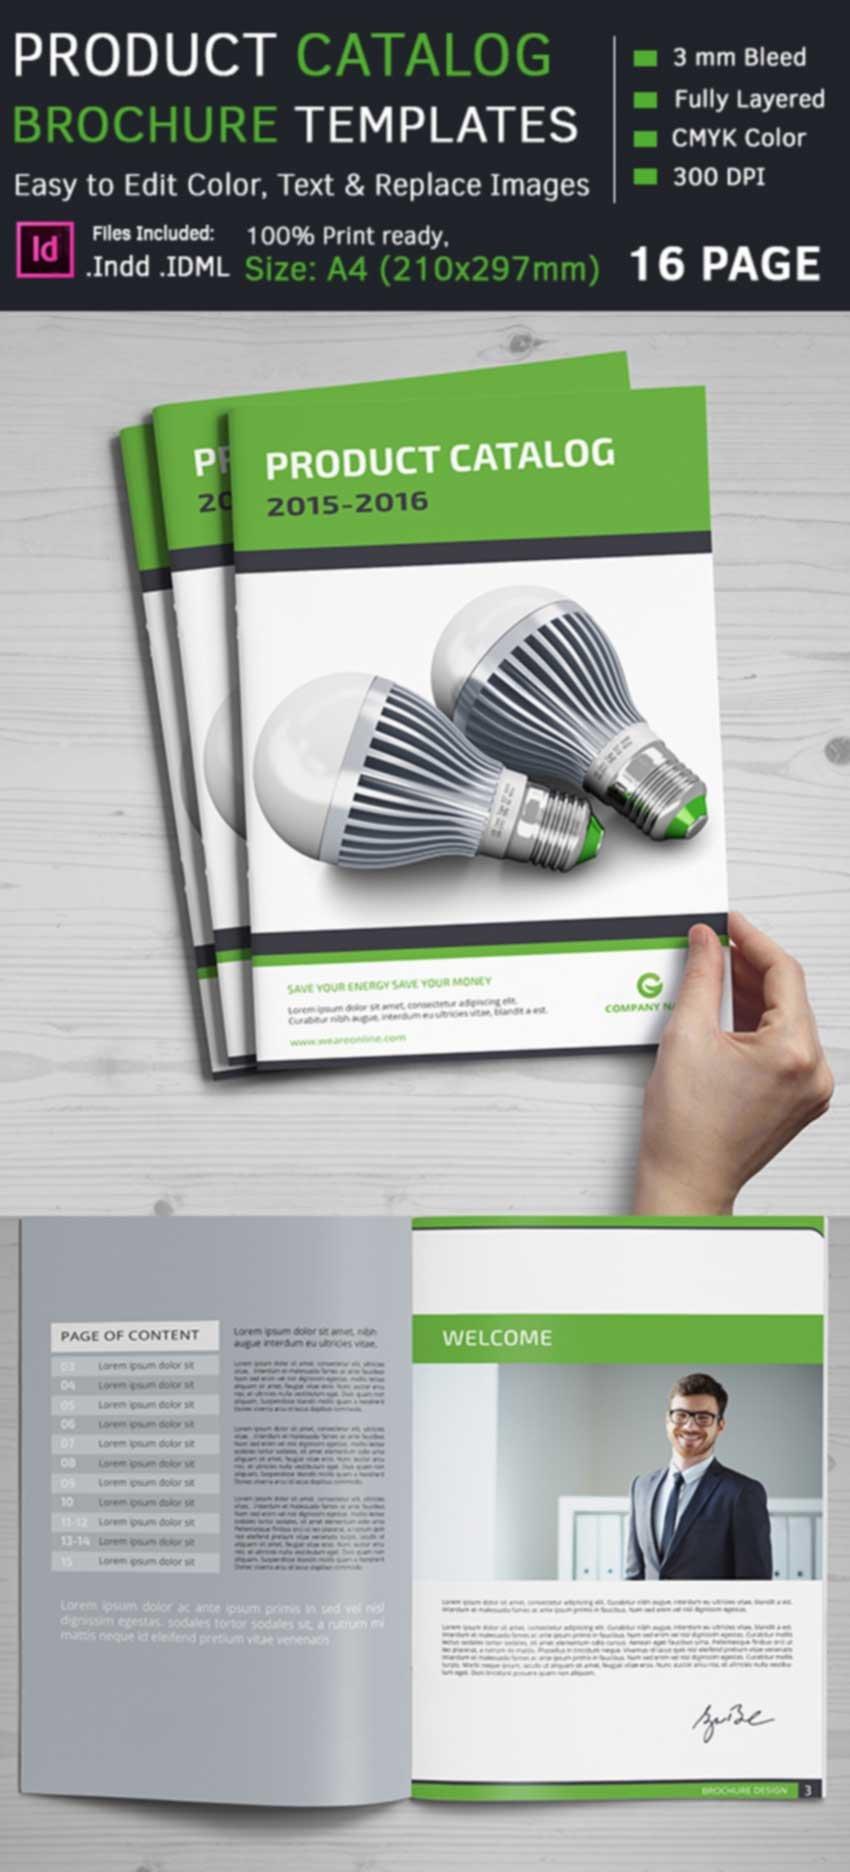 Product Catalog Brochure Templates